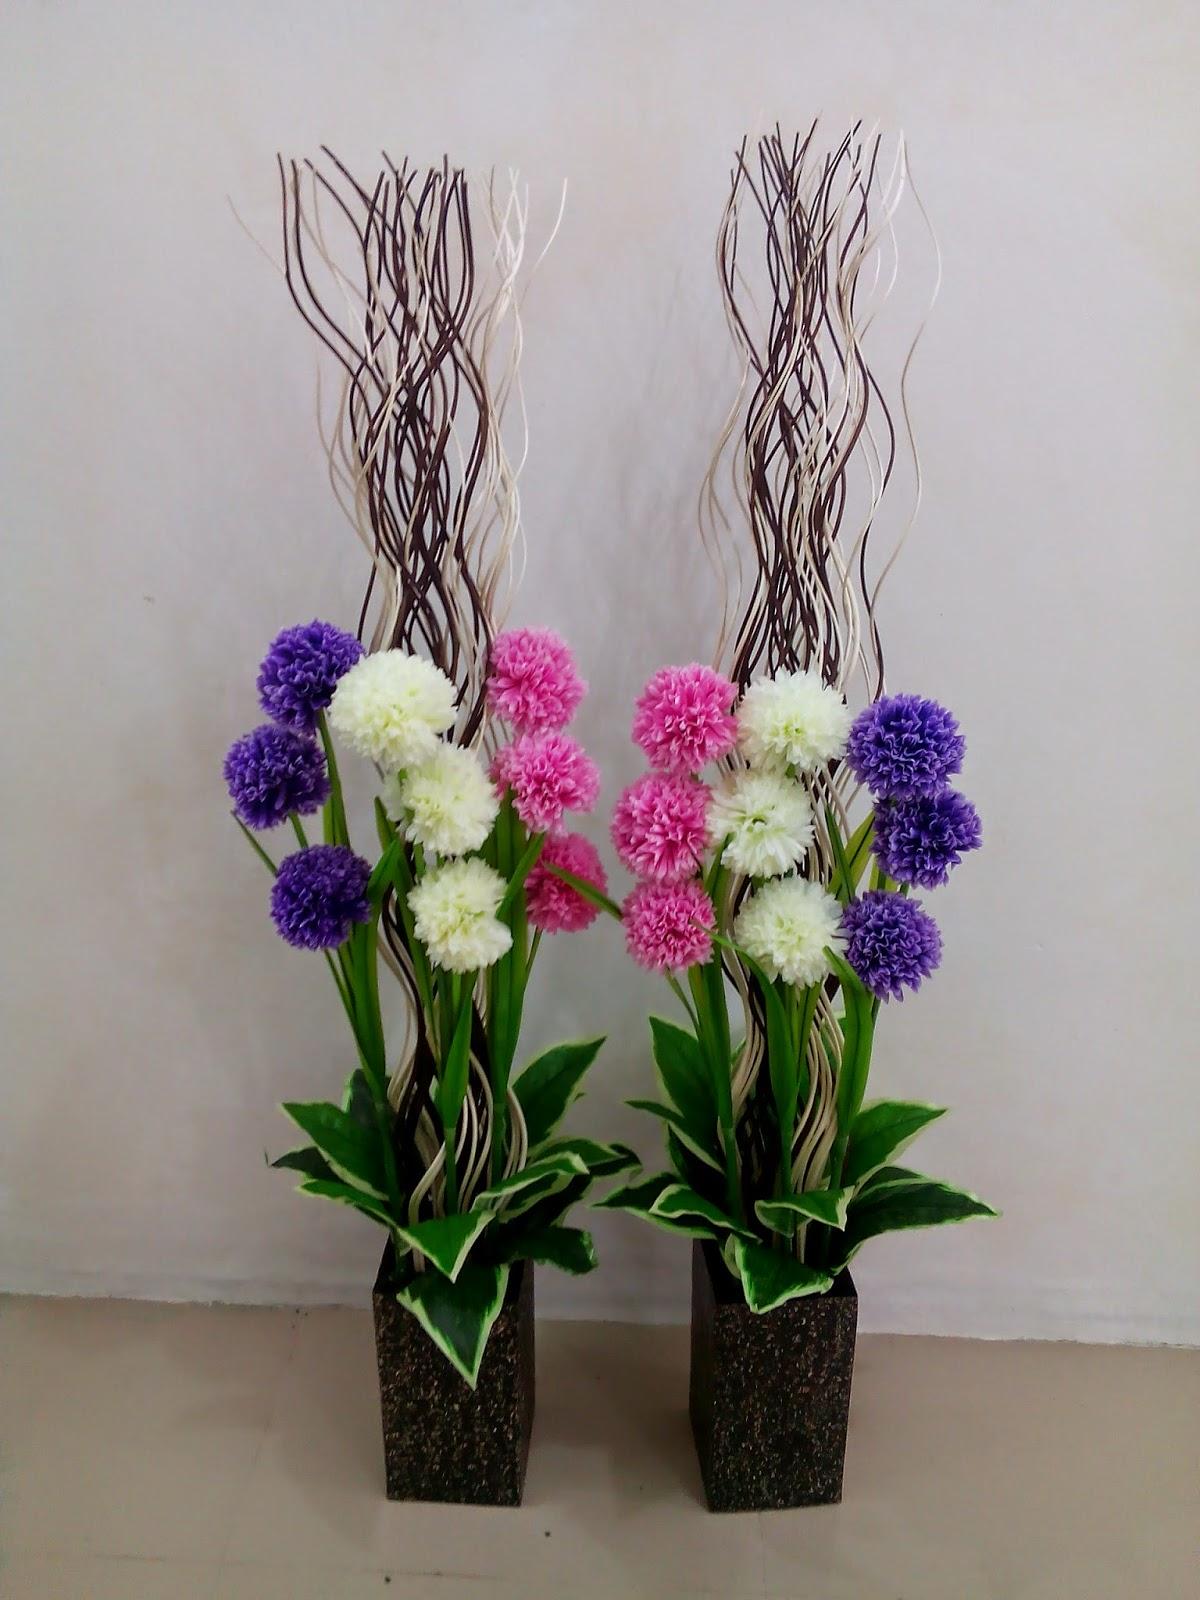 Seni Merangkai Bunga Cara Meja Dan Sudut Hiasan Ruang Tamu Desainrumahid